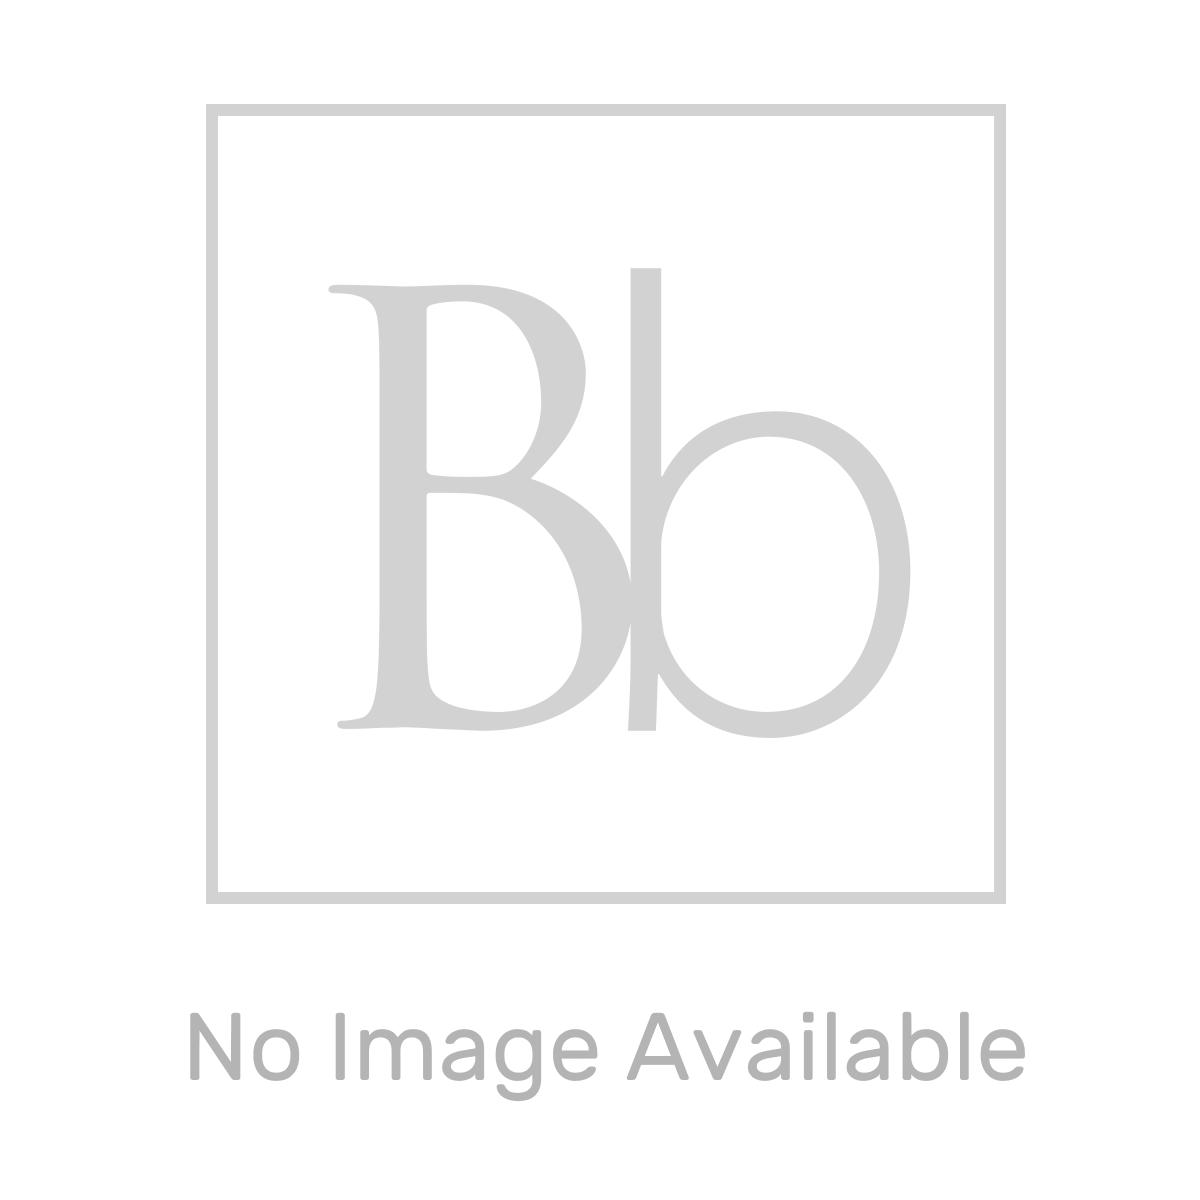 HiB Vercelli Portrait Optical LED Design Mirror